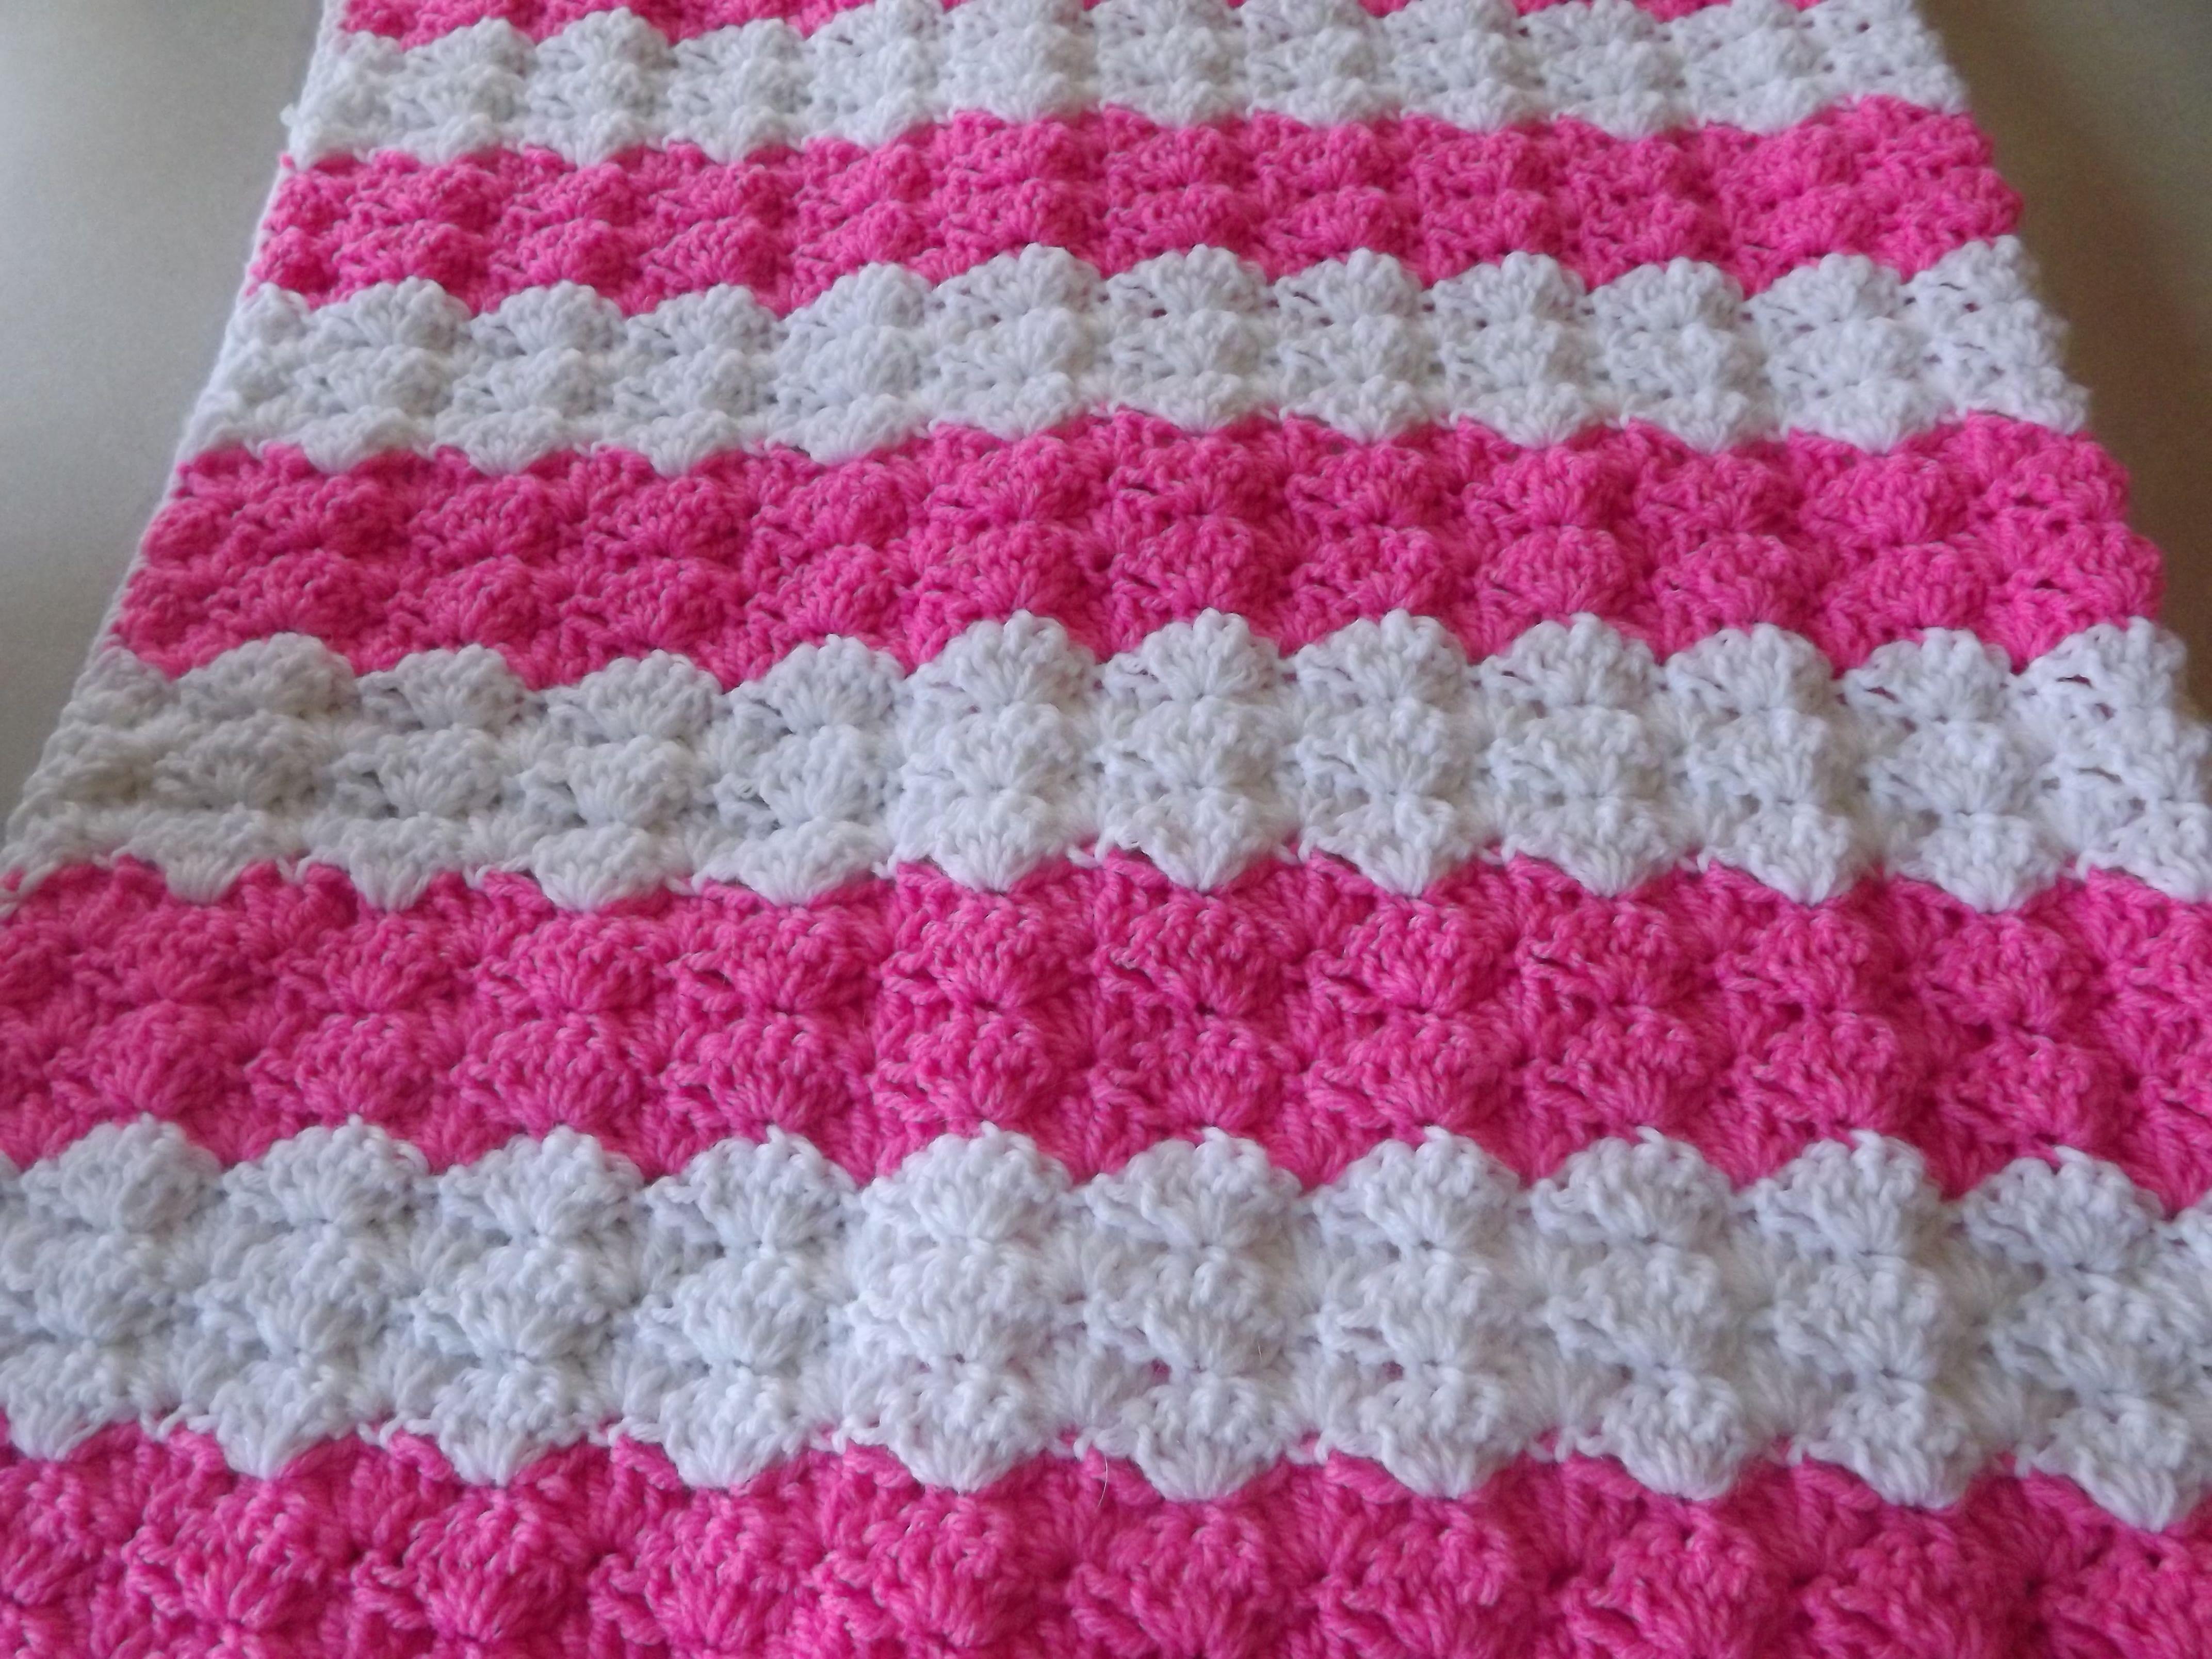 Free Crochet Baby Blanket Patterns | Crochet baby blankets, Crochet ...